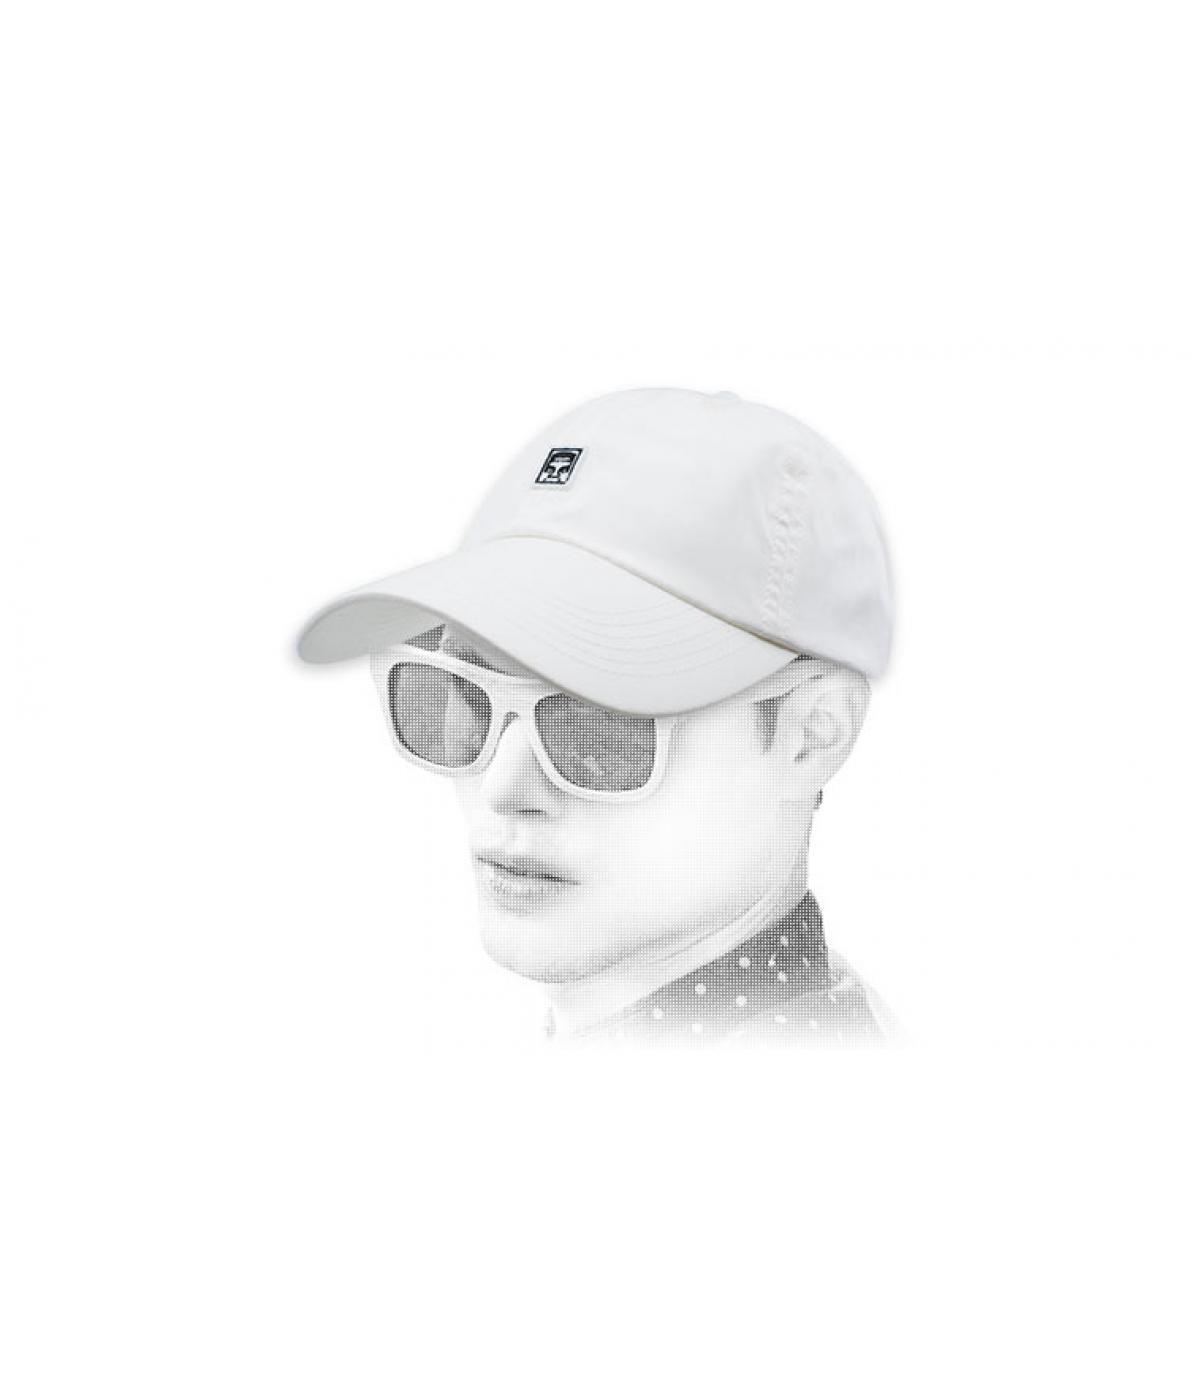 gorra blanco Obey gigante